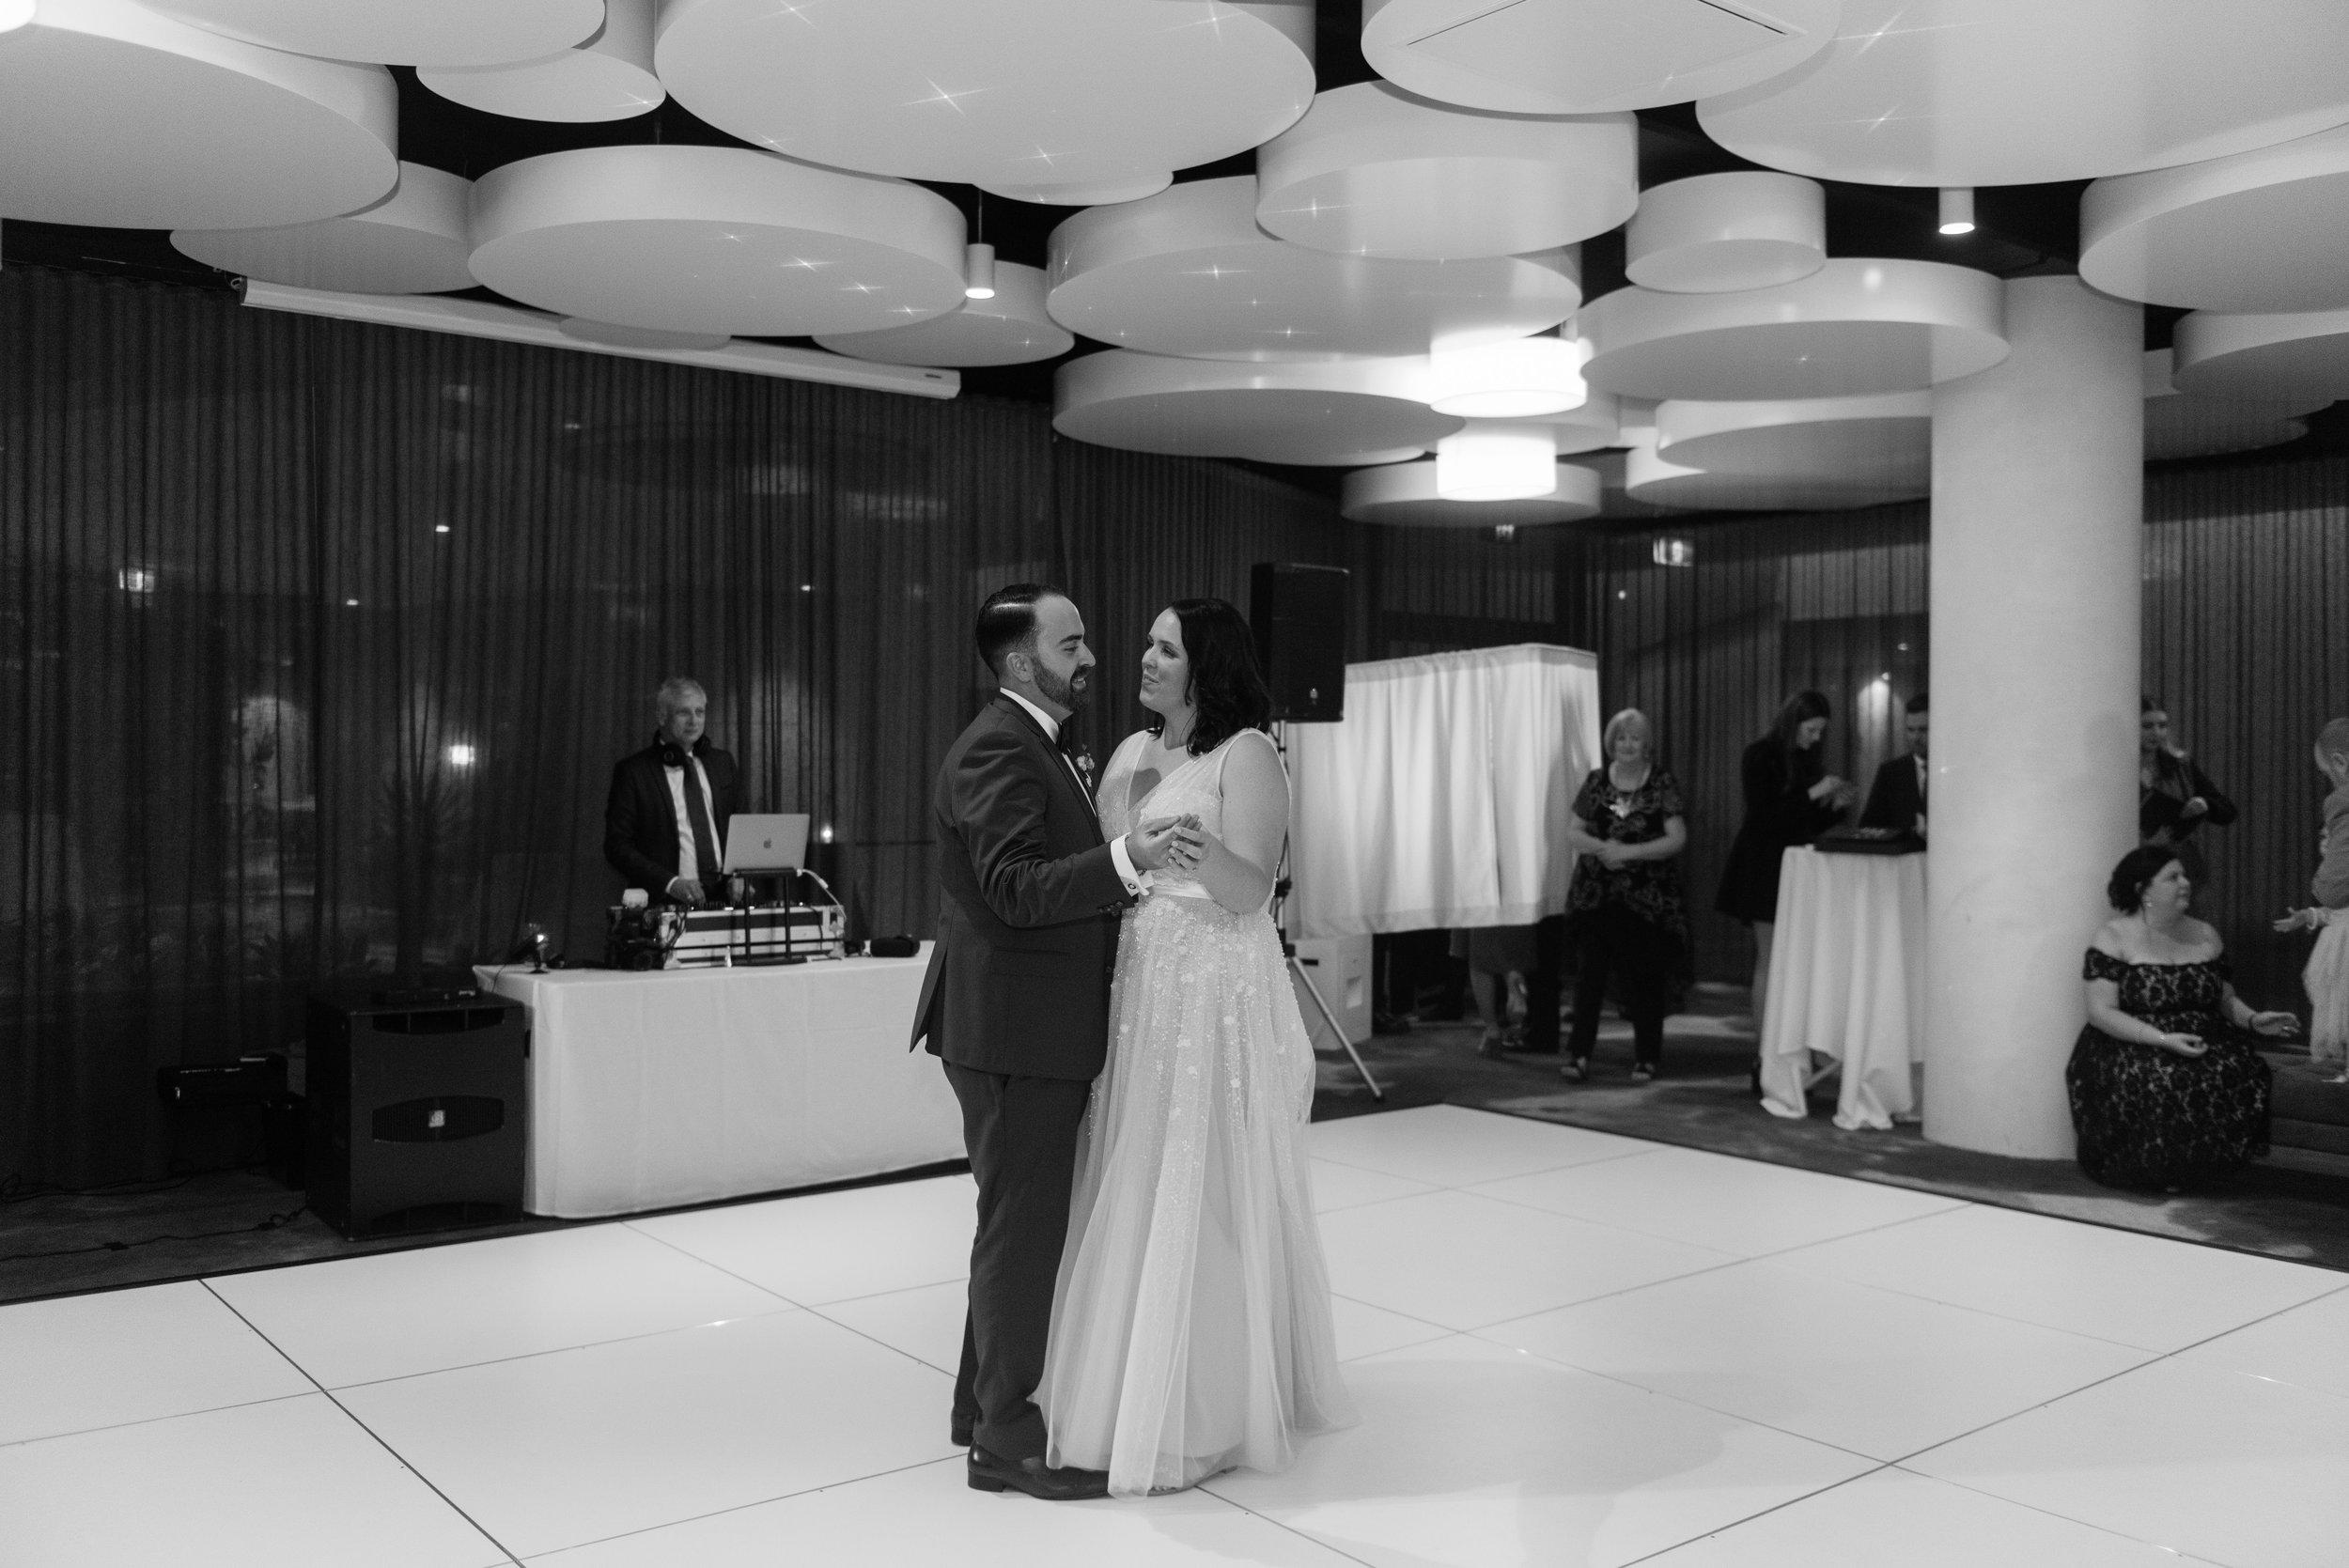 brisbane-city-wedding-photographer-romantic-wedding-114.jpg